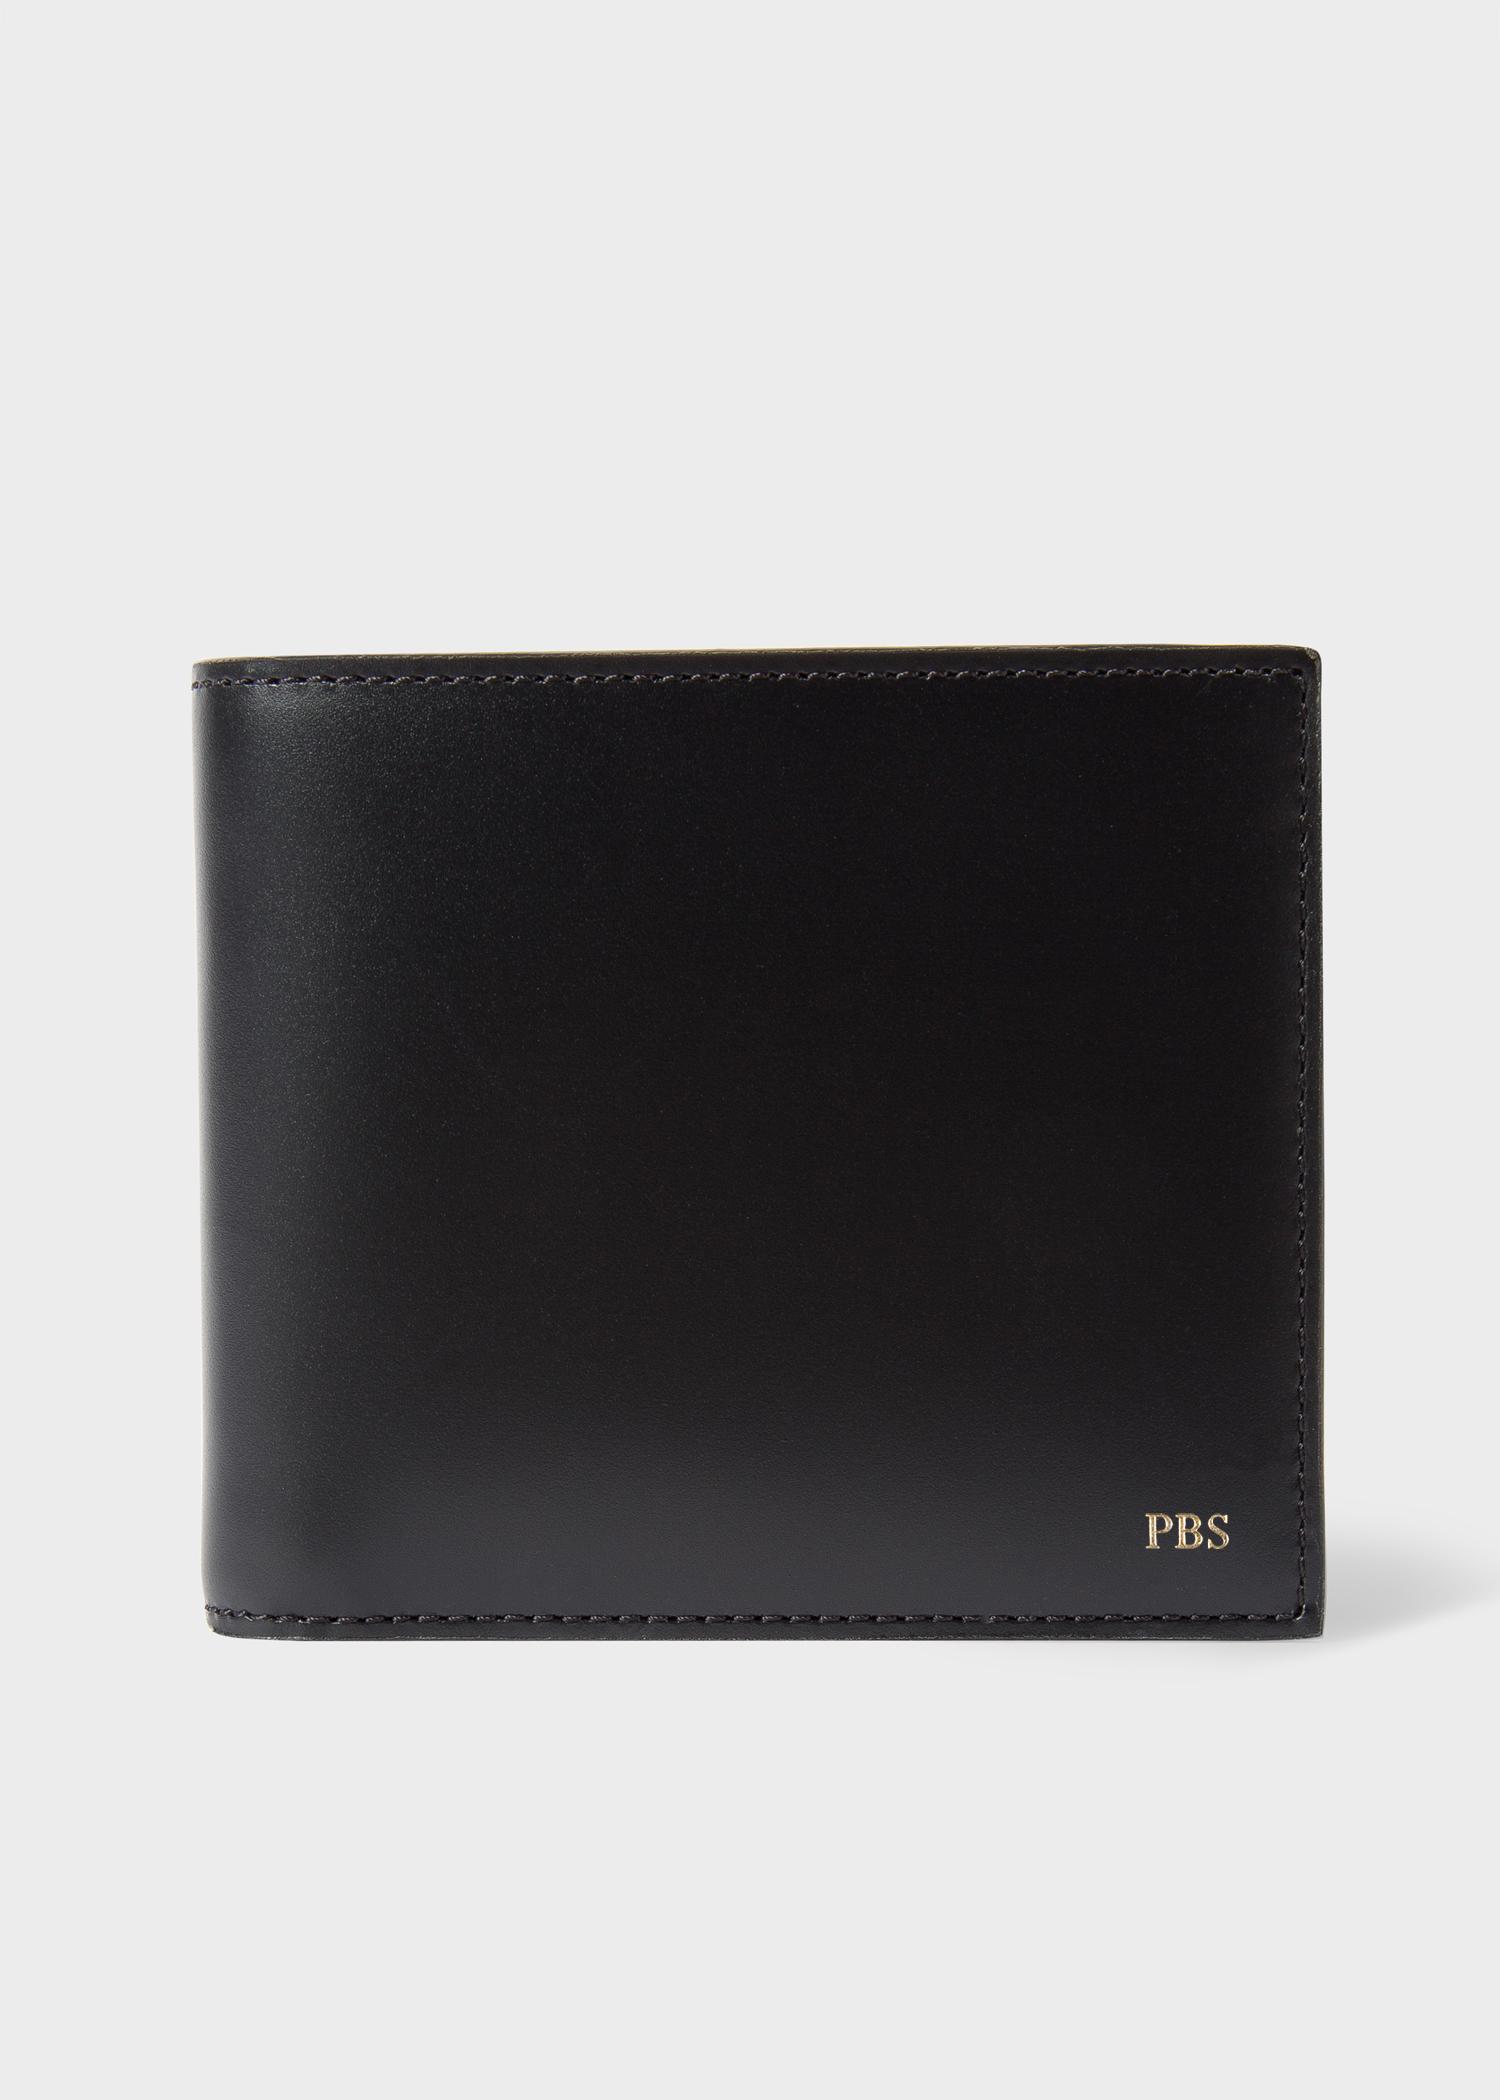 Men S Black Leather Monogrammed Billfold Wallet By Paul Smith